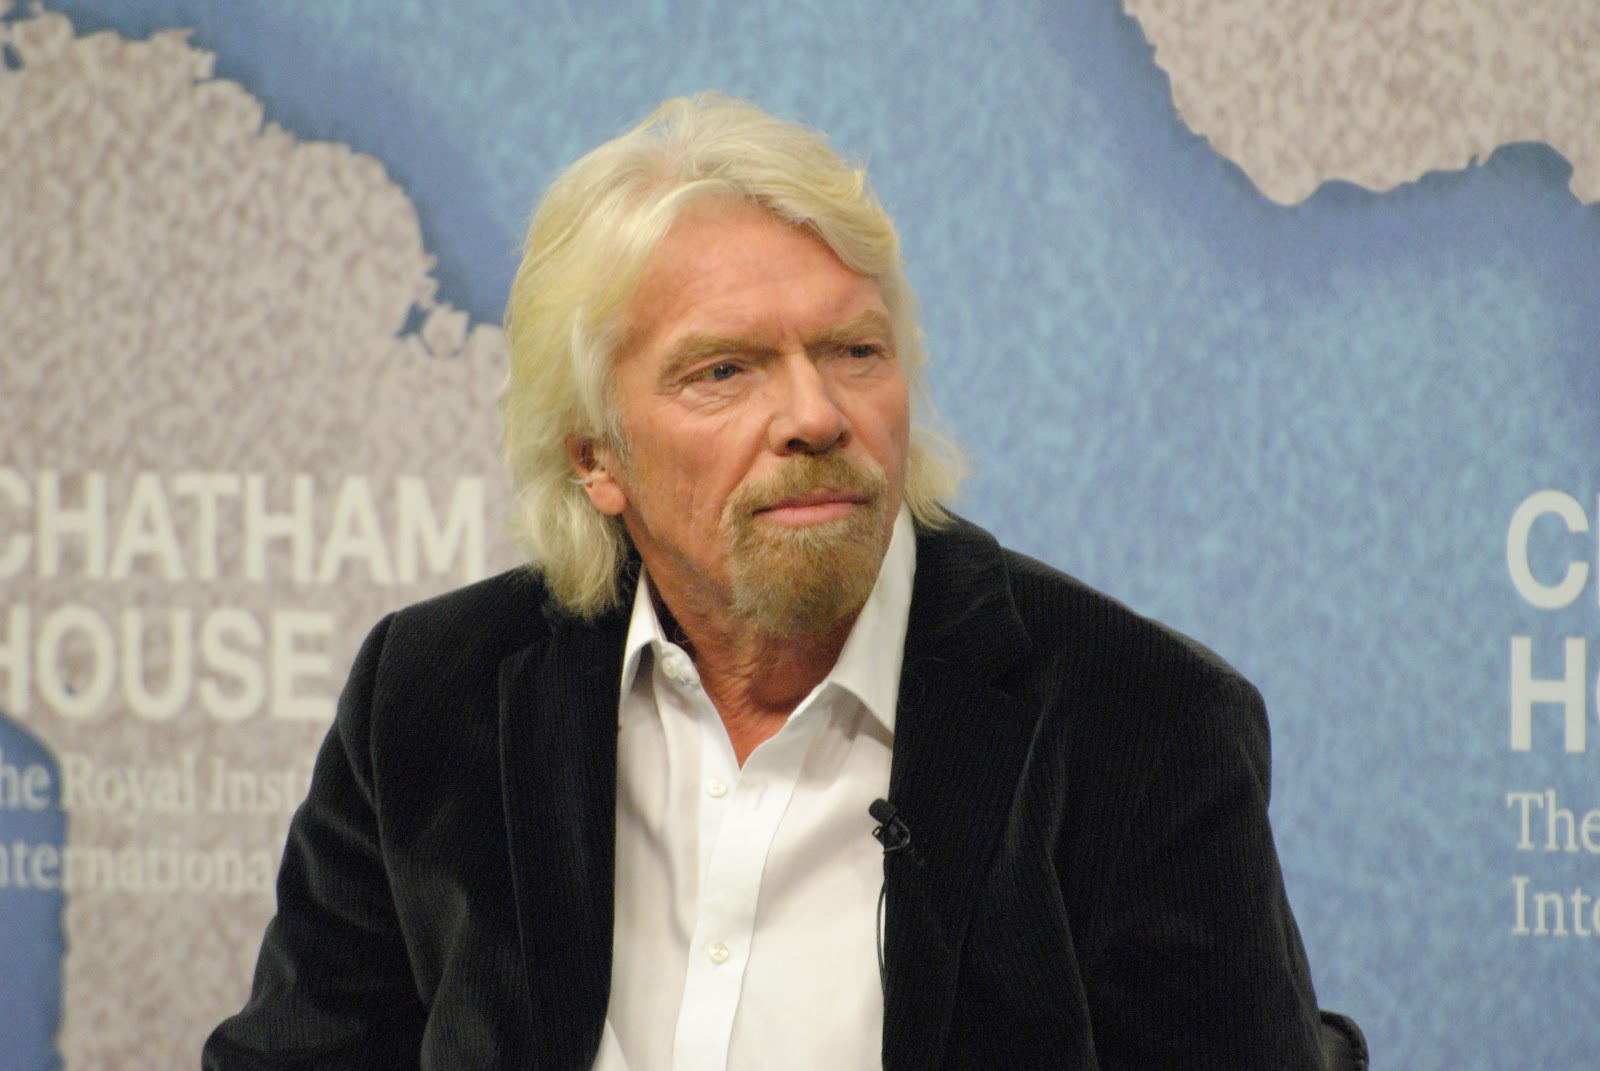 Richard_Branson_March_2015.jpg